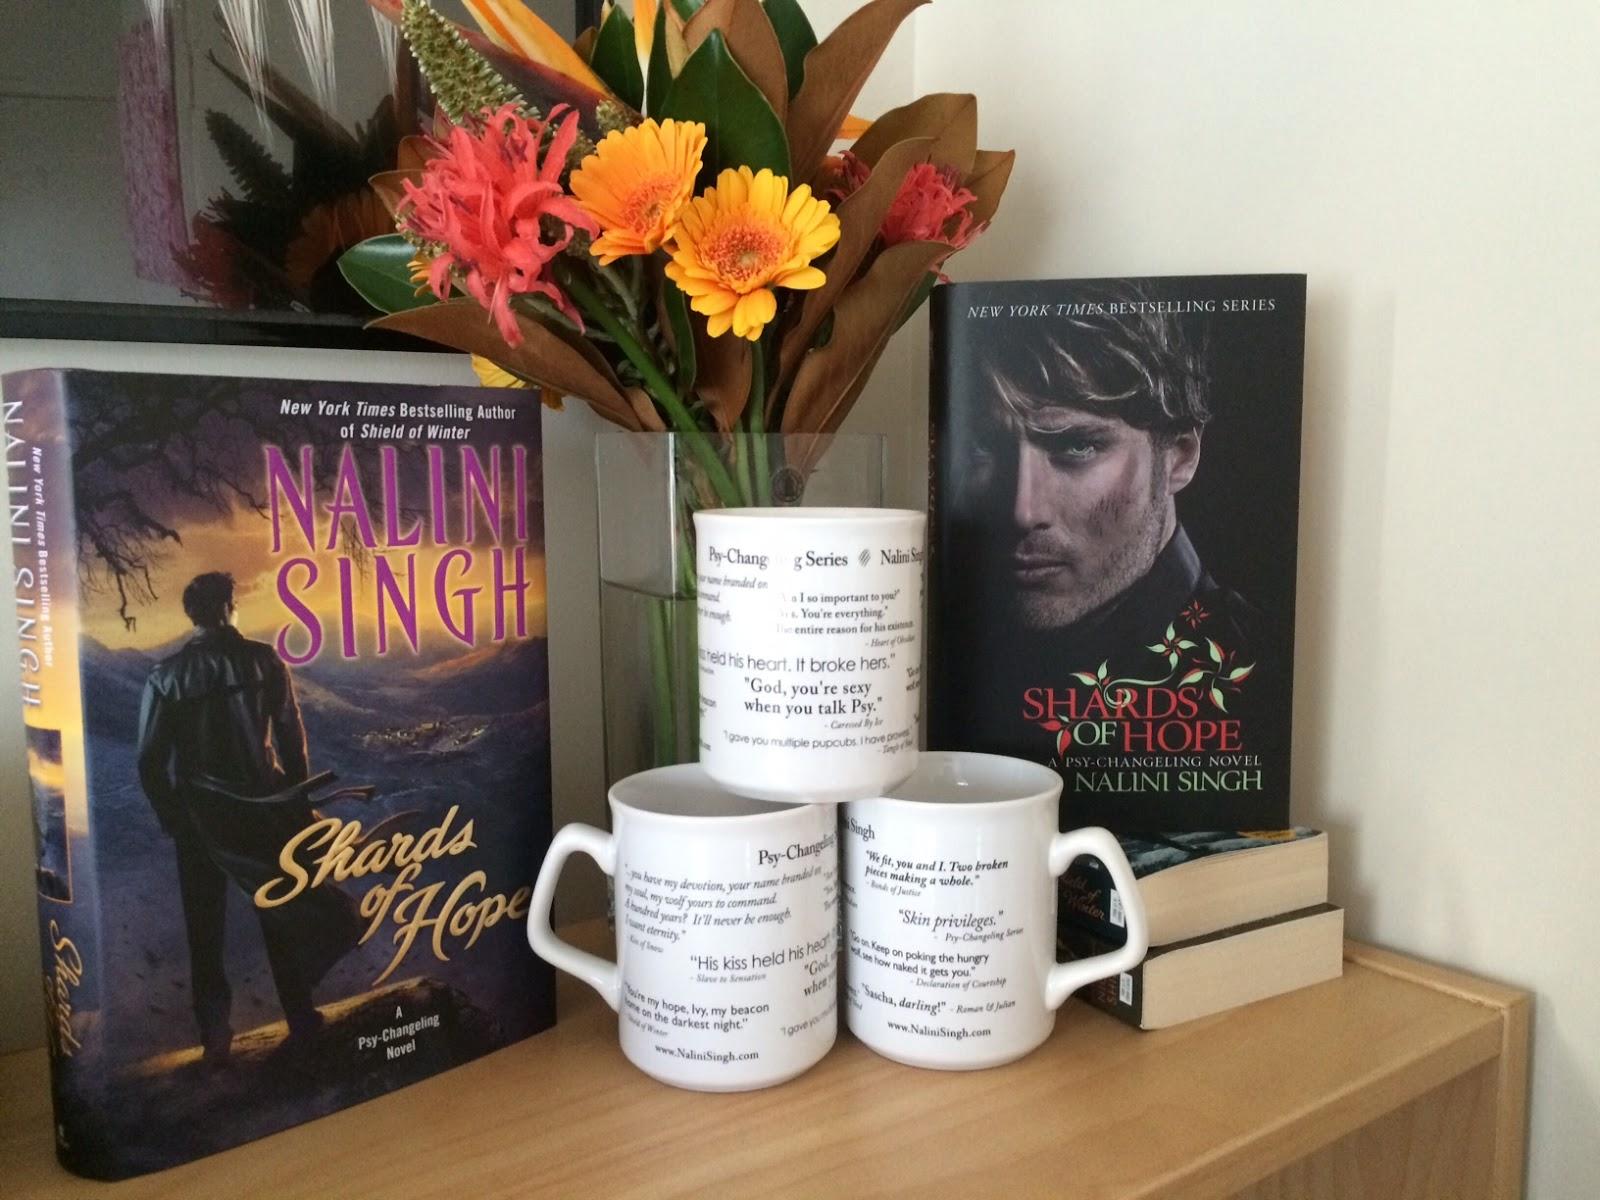 NALINI SINGH SHARDS OF HOPE EBOOK DOWNLOAD